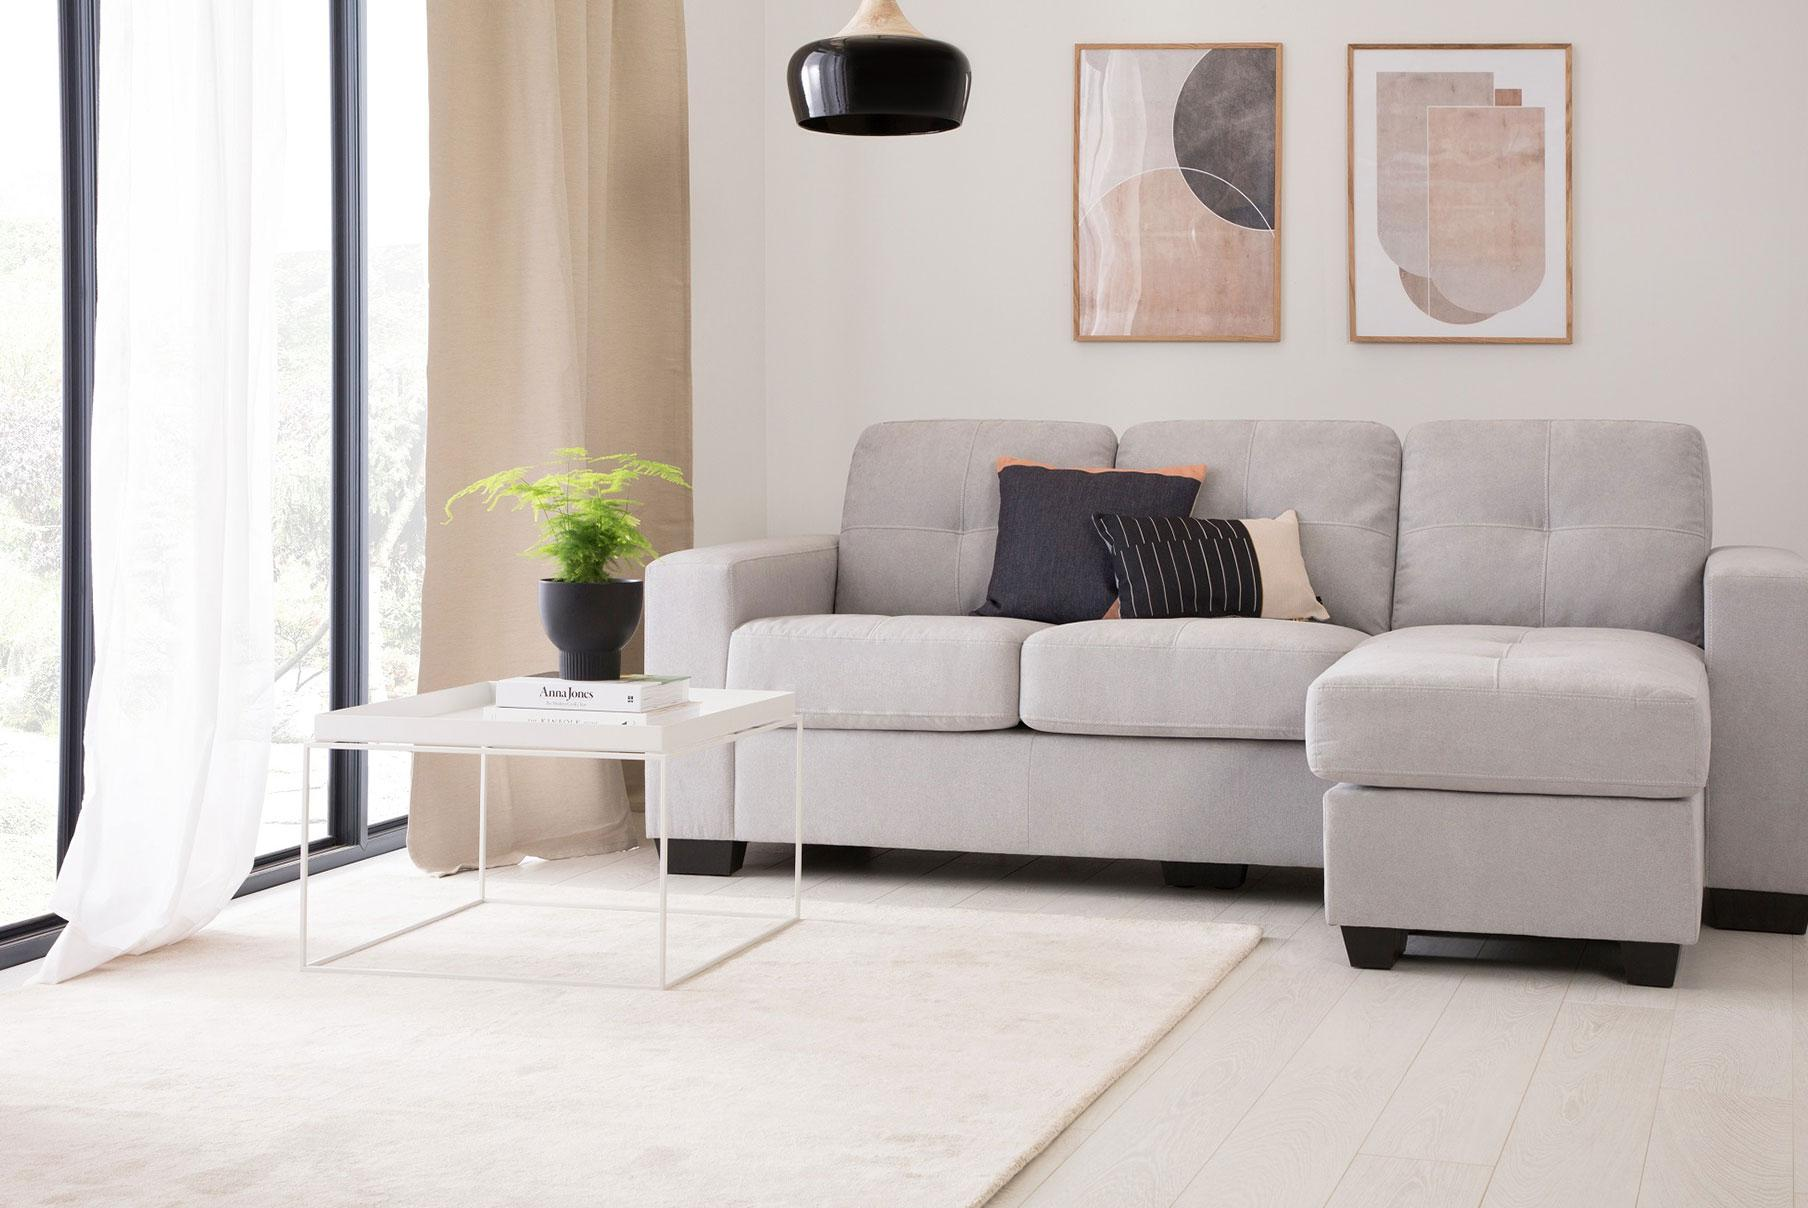 Scandinavian style grey living room with a grey sofa